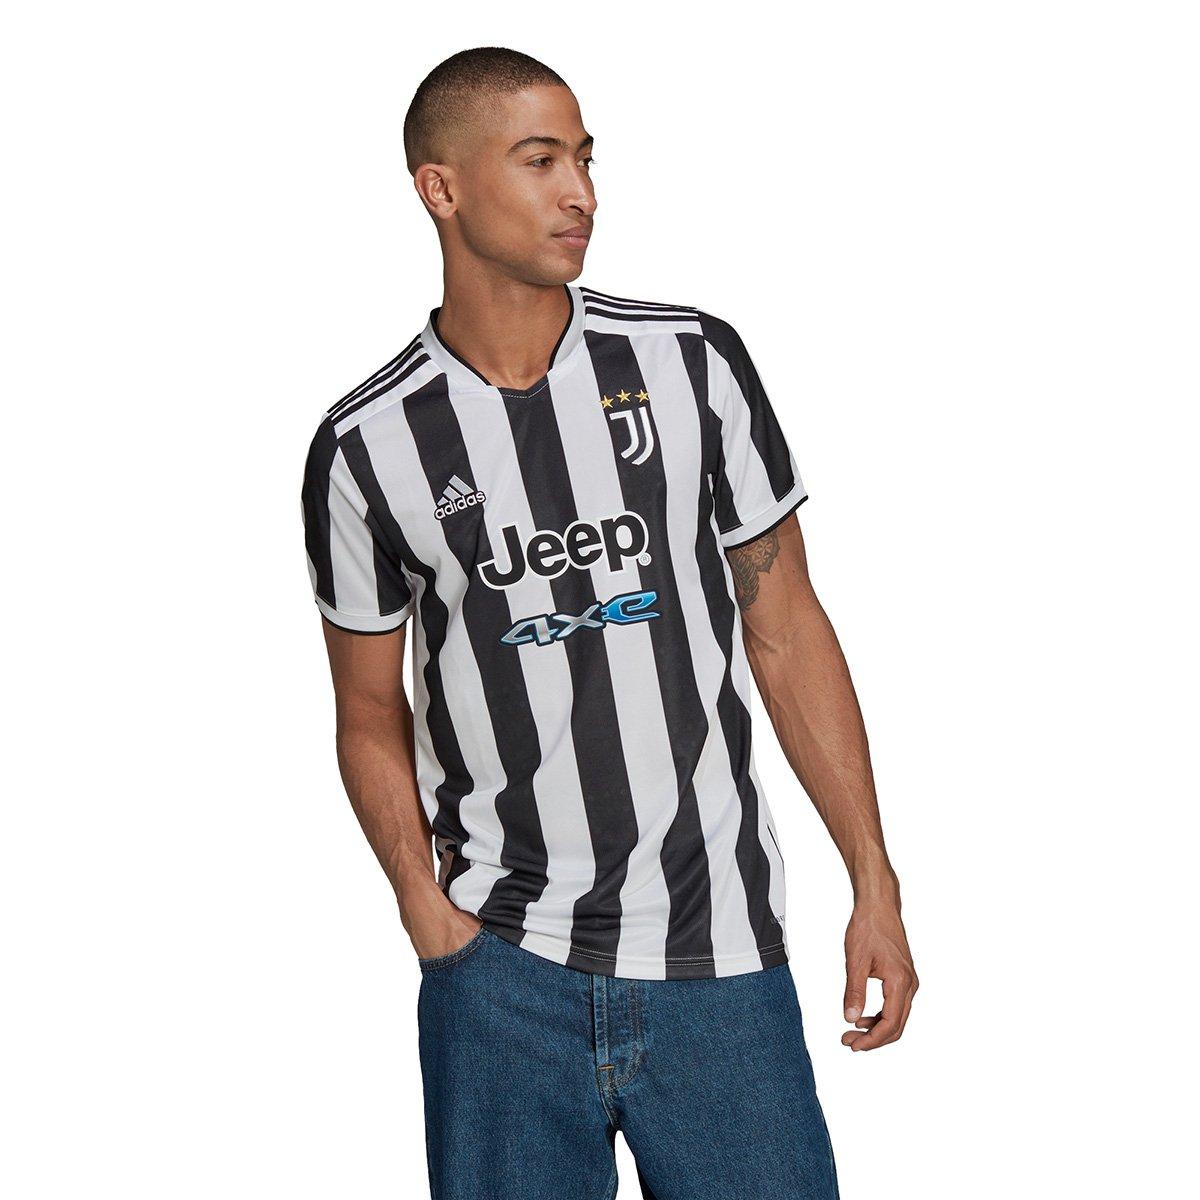 Camisa Juventus Home 21/22 s/n° Torcedor Adidas Masculina